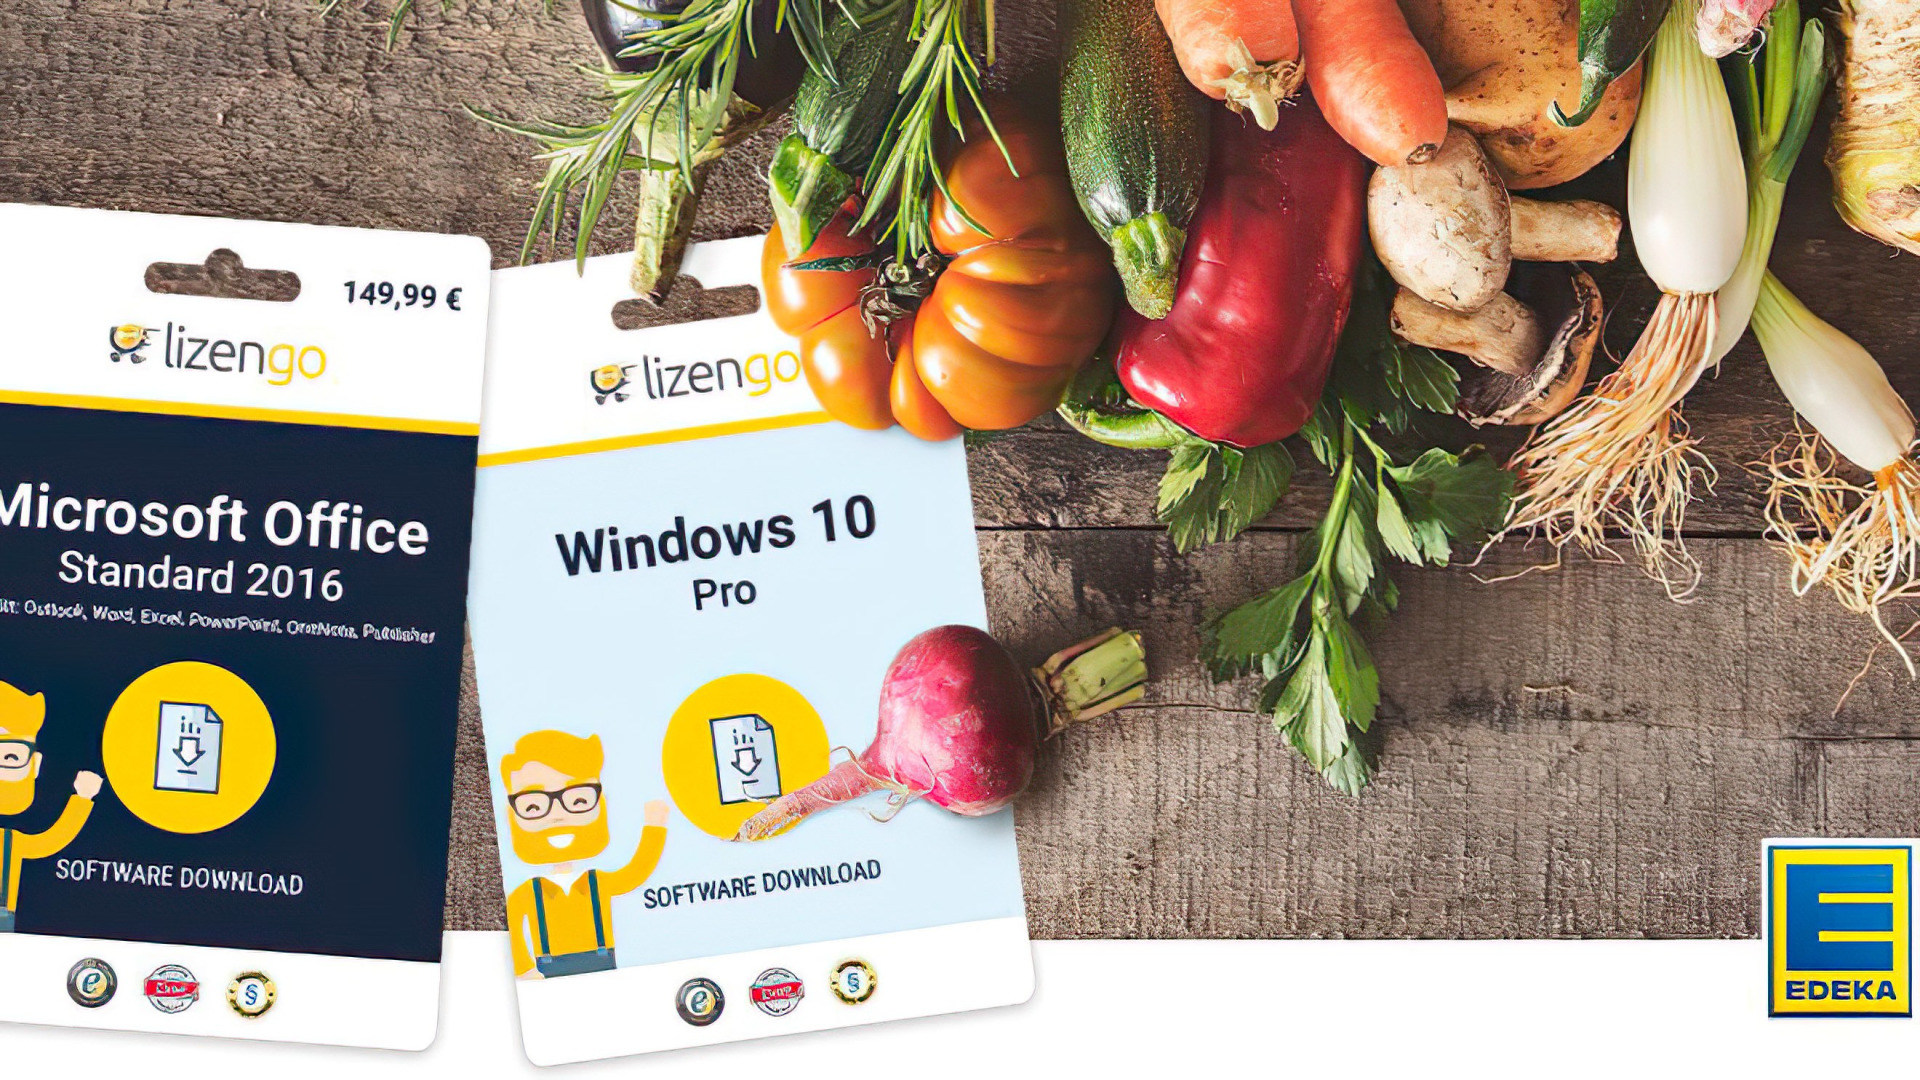 Windows 10, Office, Lizenz, Volumenlizenz, Lizengo, Edeka